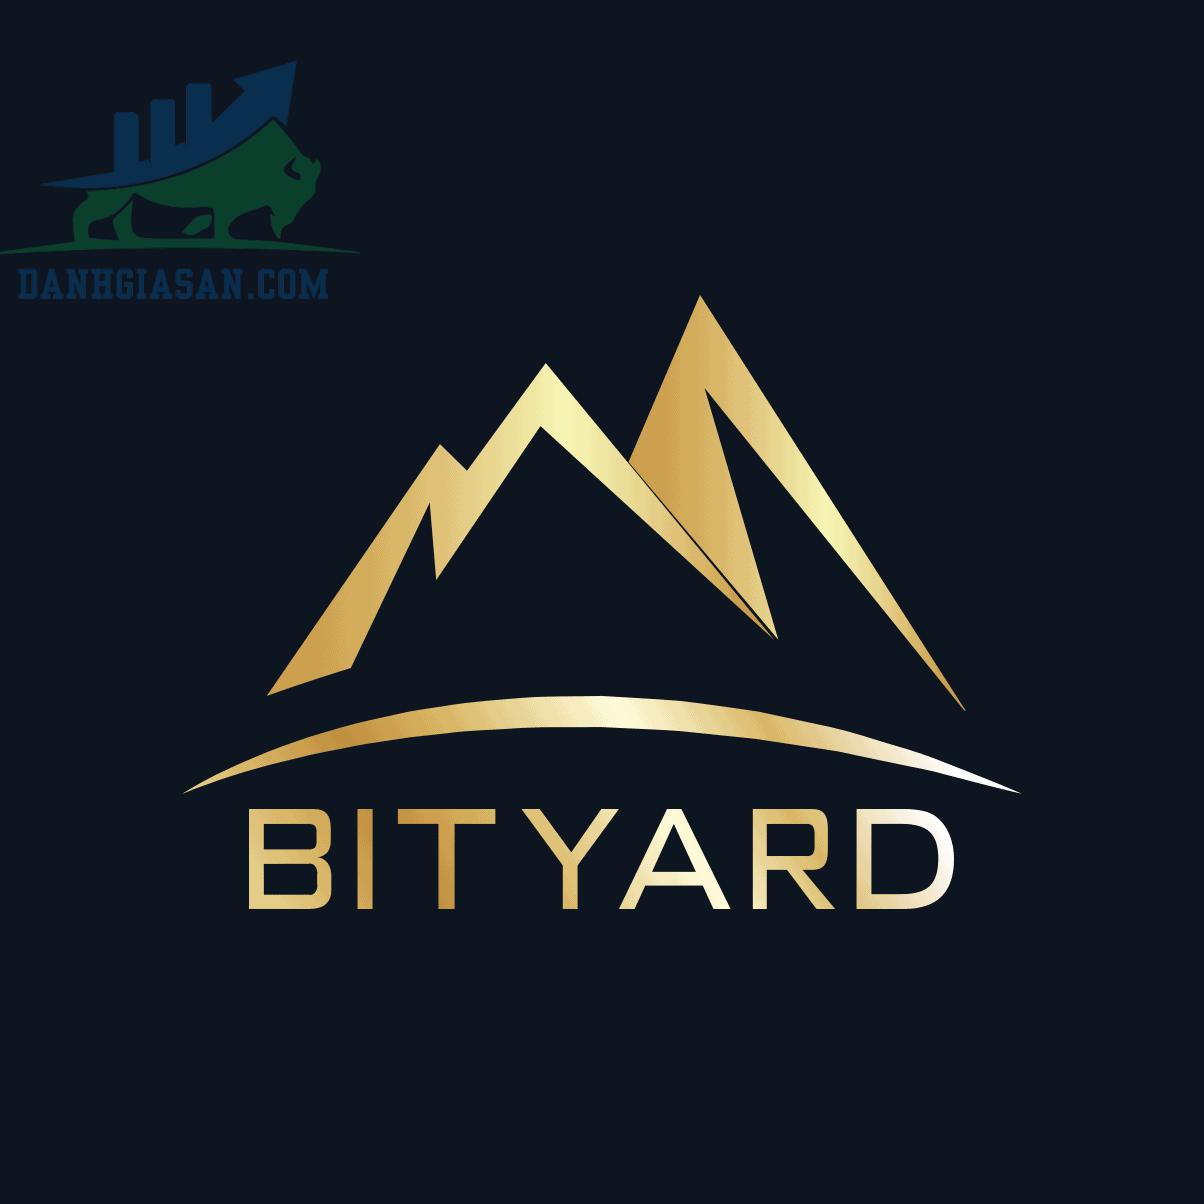 Bityard